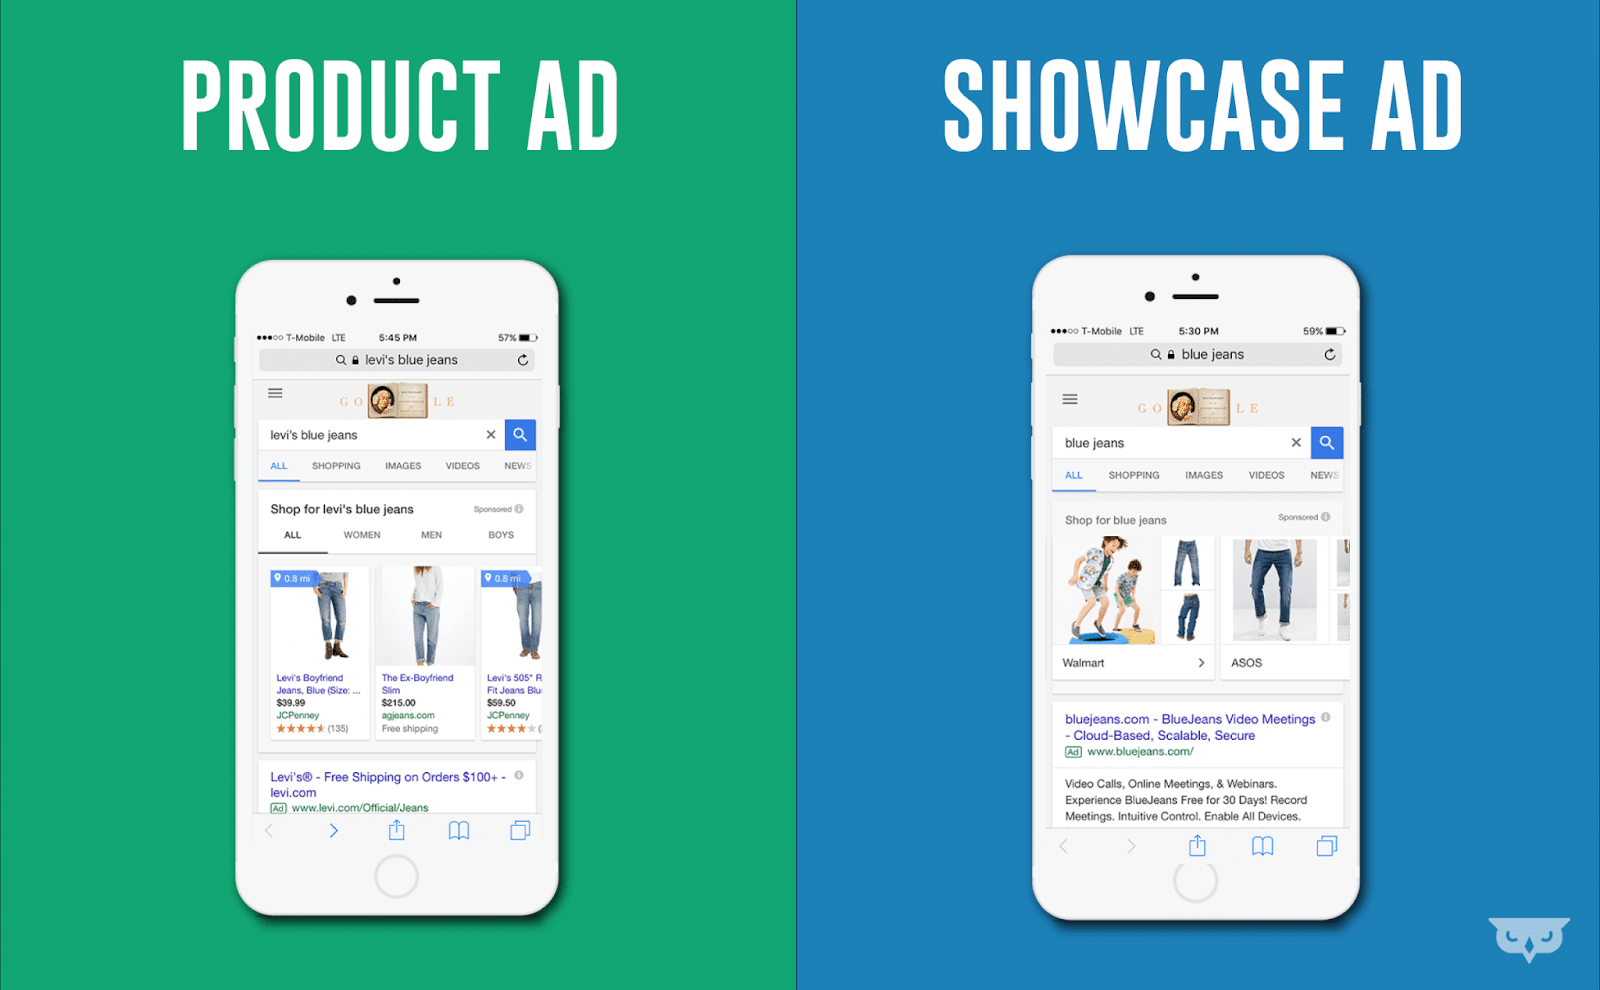 Product Ad vs Showcase Ad